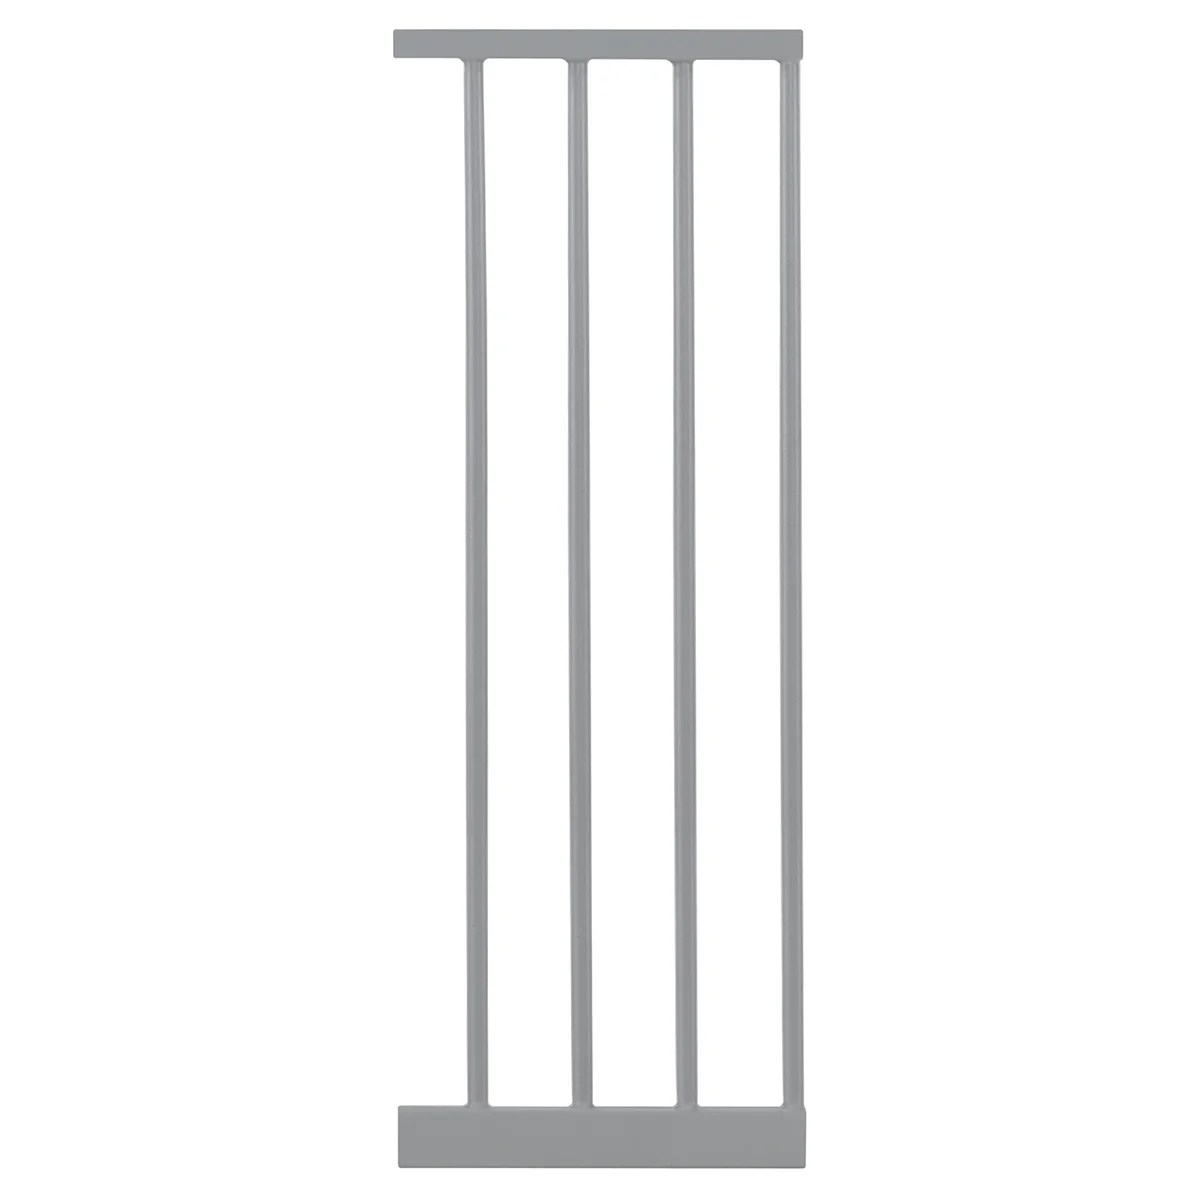 Barriere De Securite Leroy Merlin